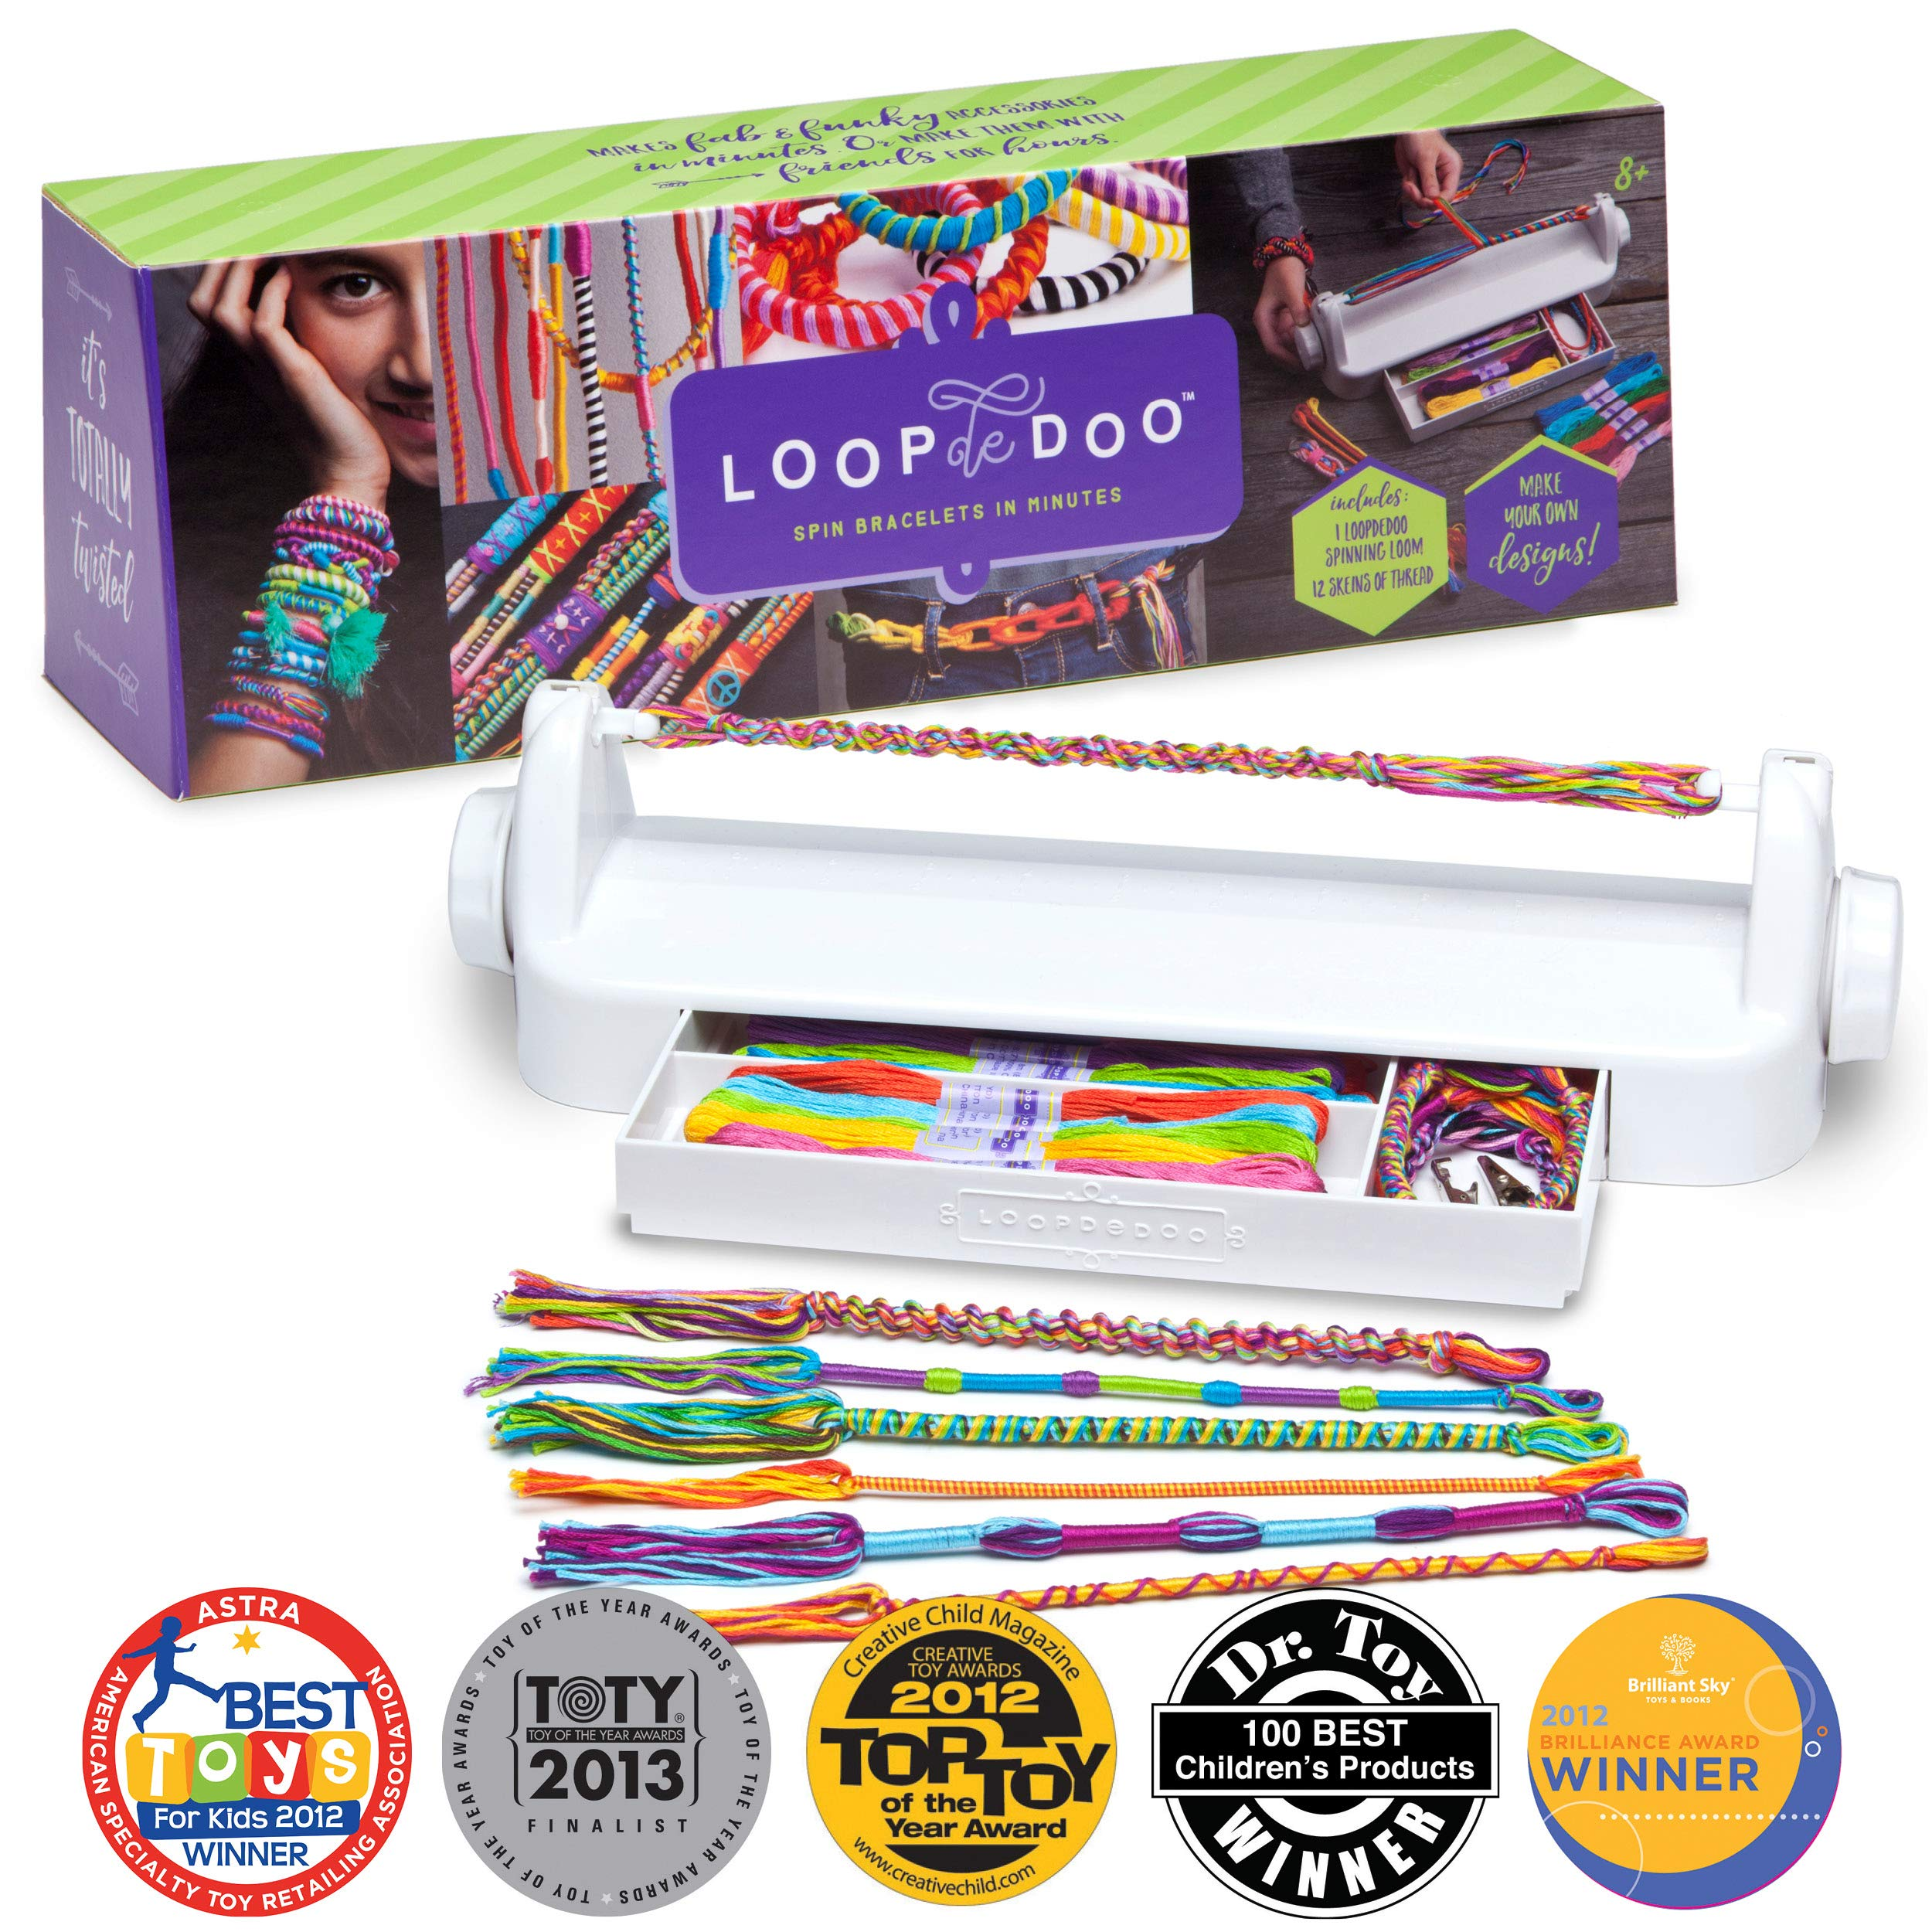 Loopdedoo - DIY Friendship Bracelet Maker Kit - Make Bracelets In Minutes - Award-Winning Craft Kit by Loopdedoo